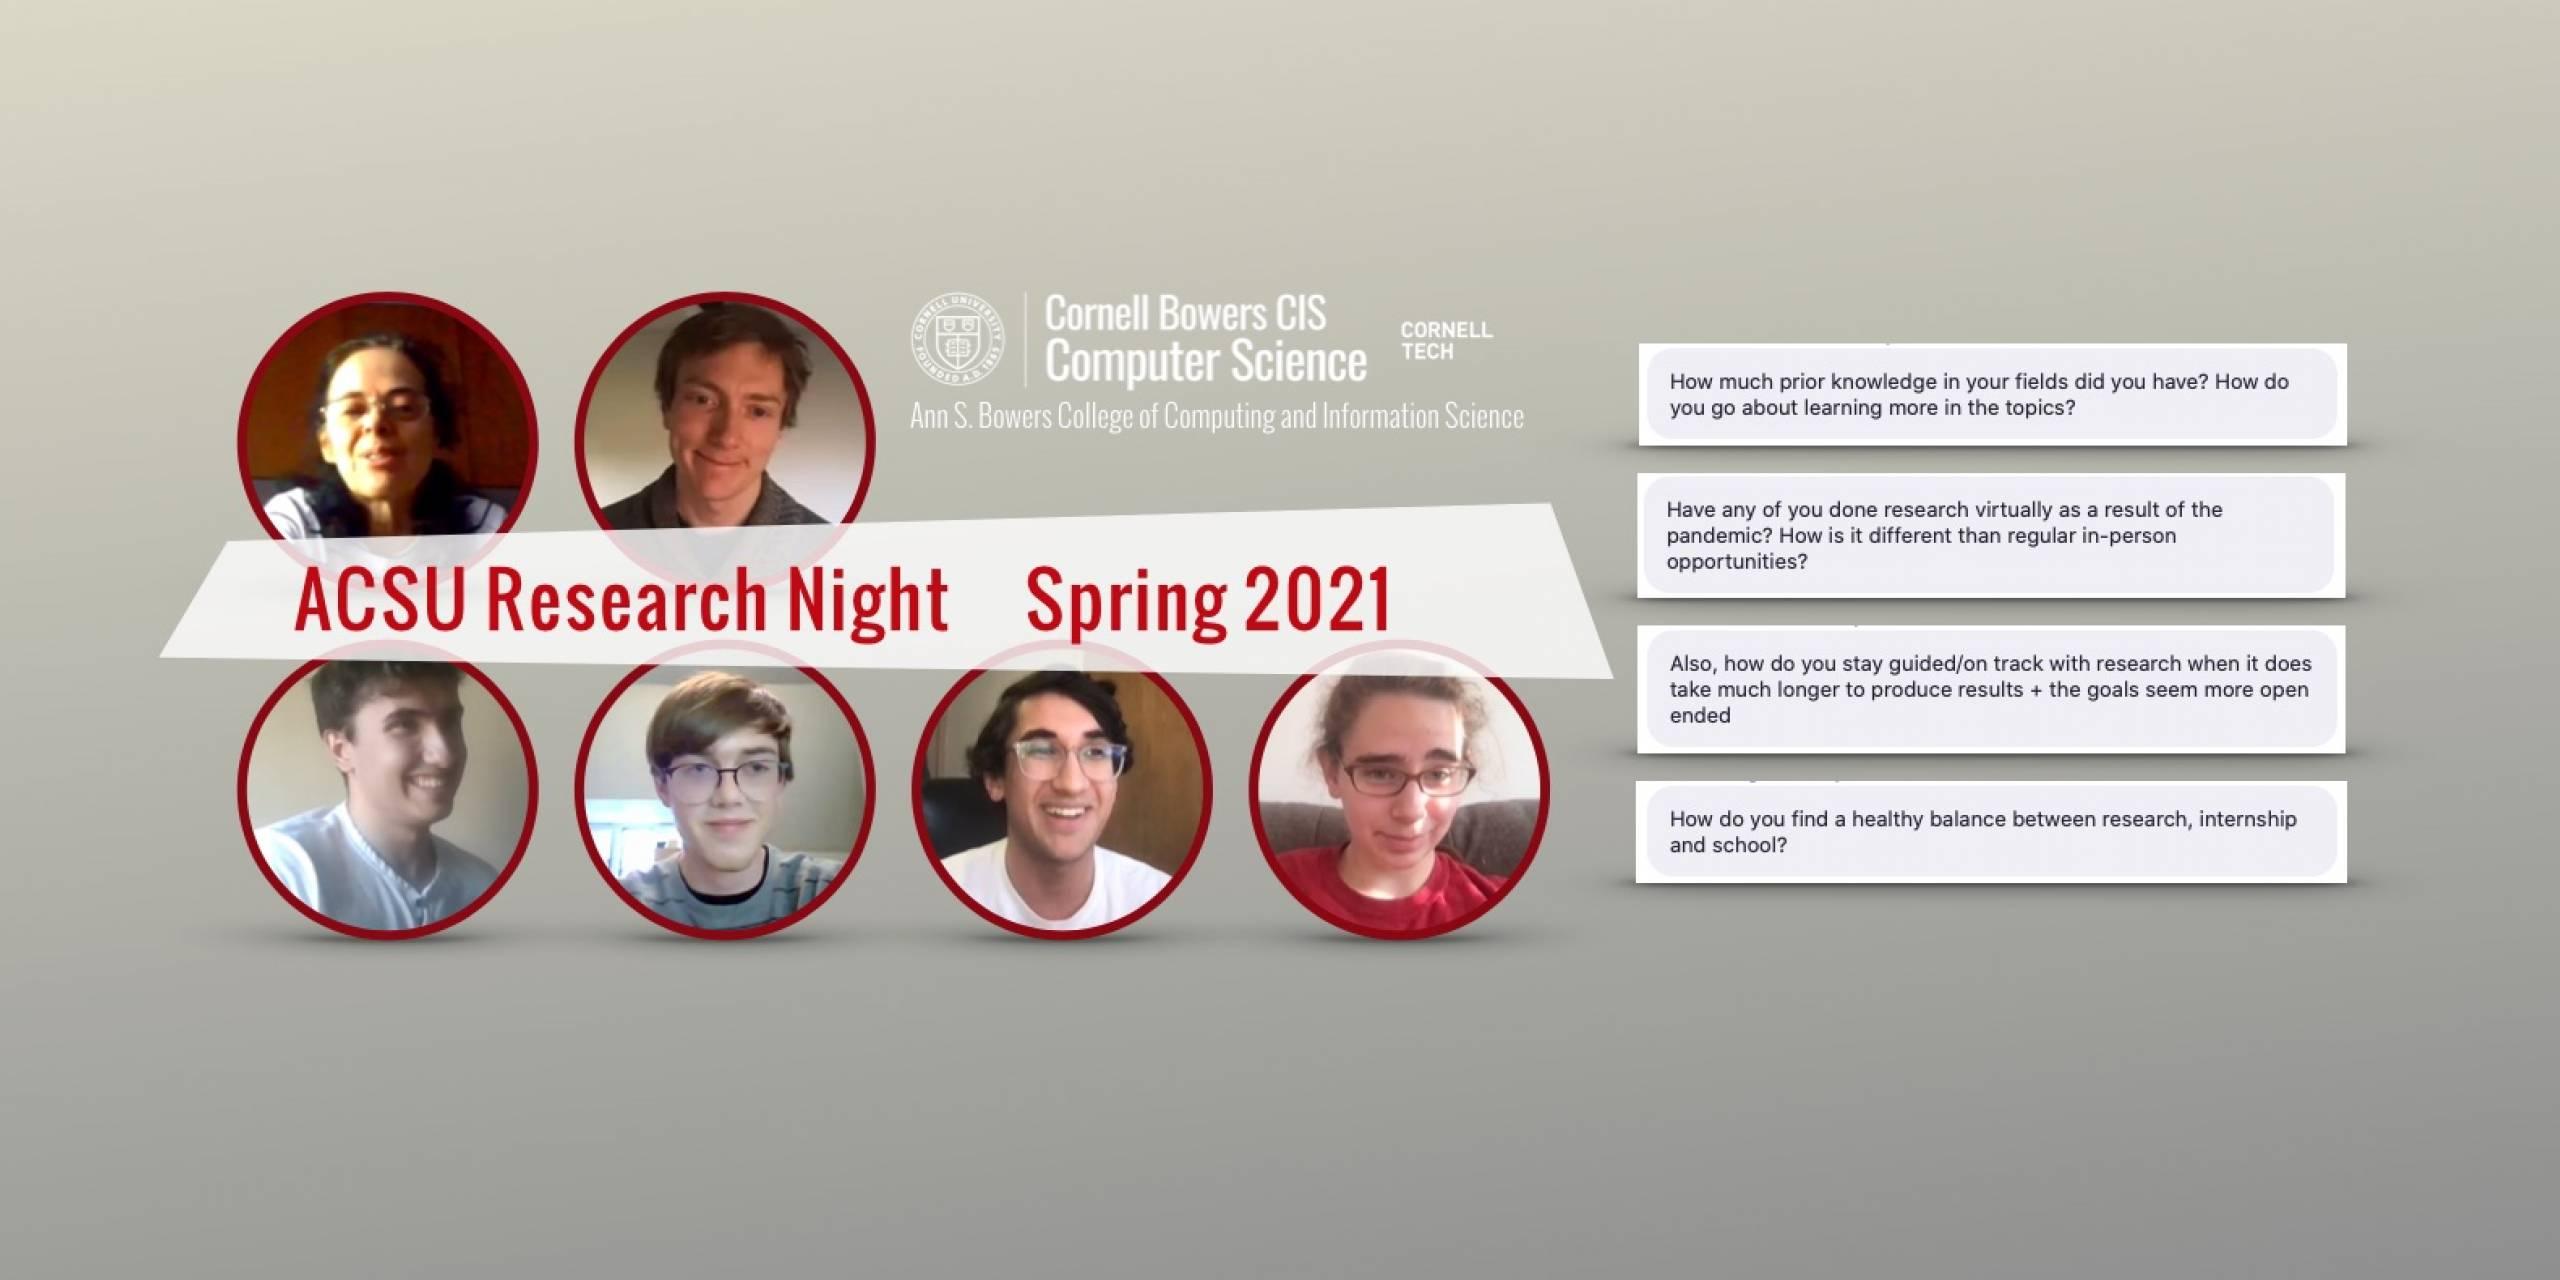 ACSU Research Night — Spring 2021